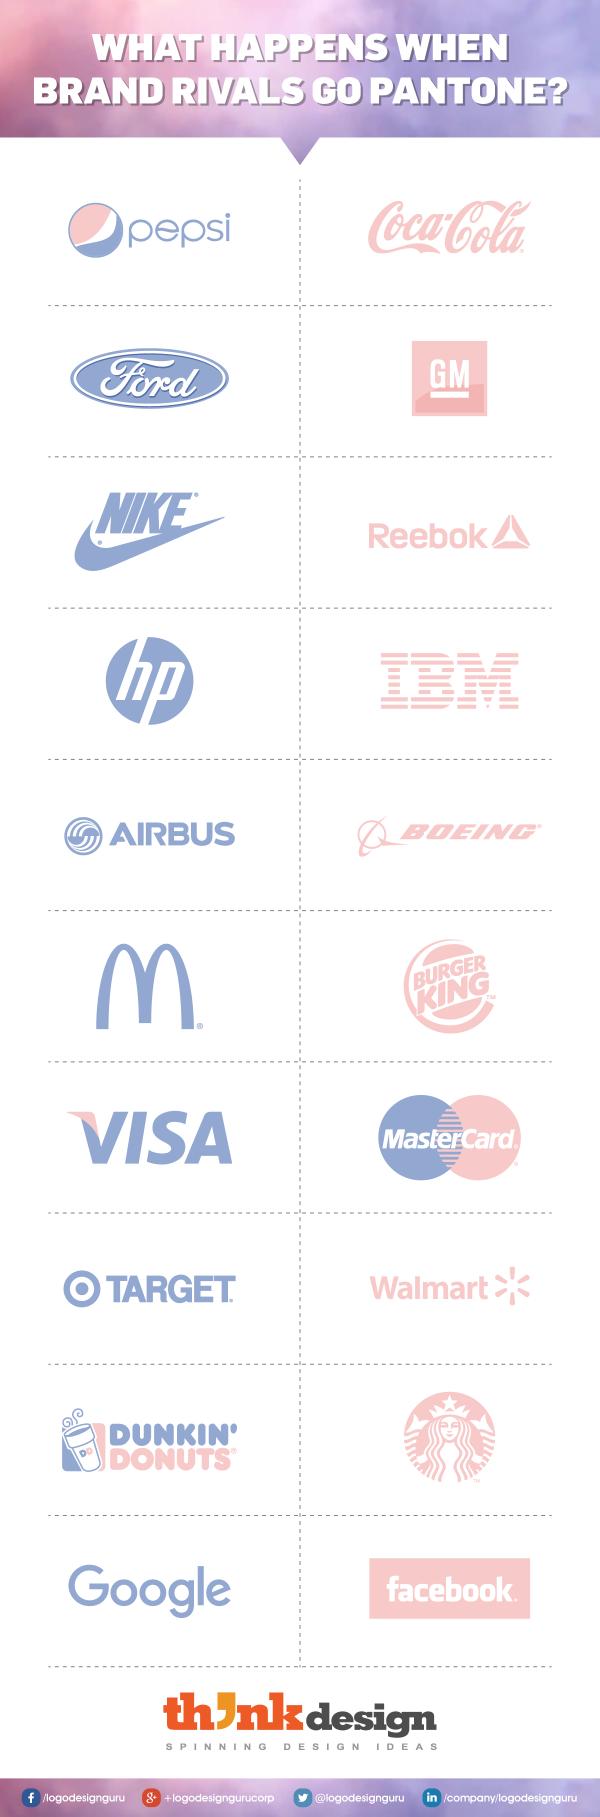 What Happens When Brand Rivals Go Pantone